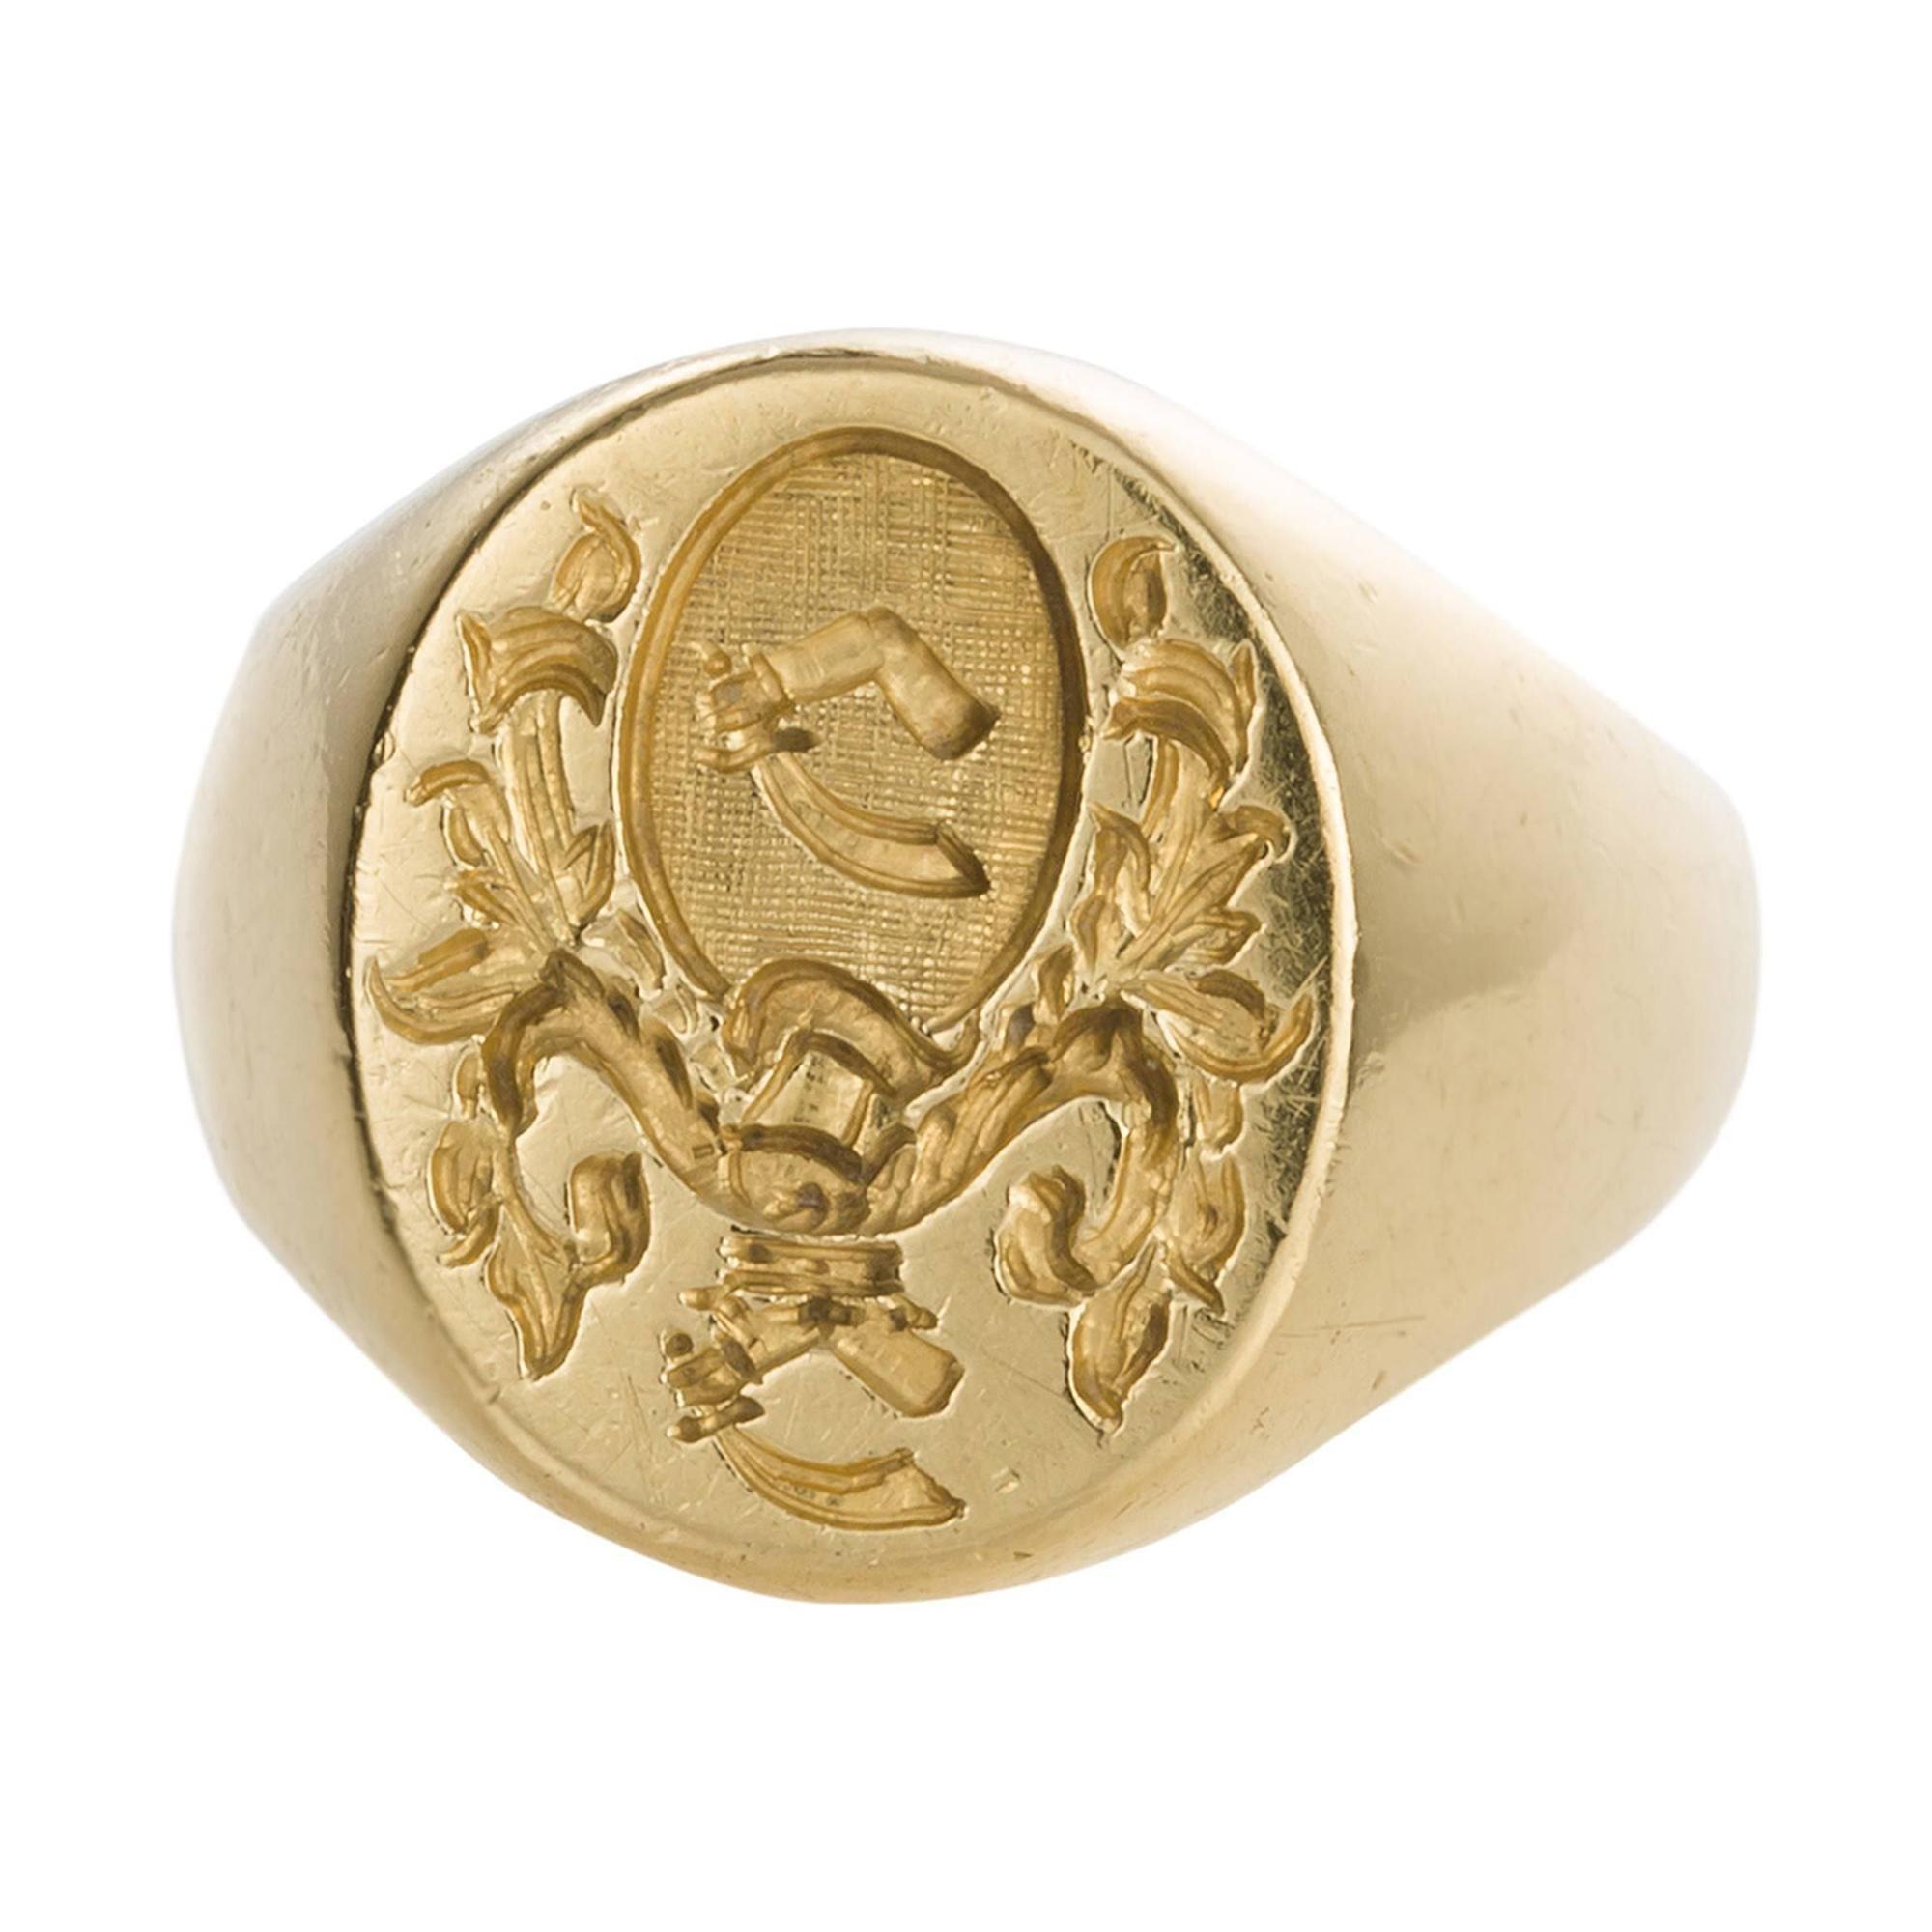 18 Karat Yellow Gold Hand Engraved Crest Unisex Signet Ring